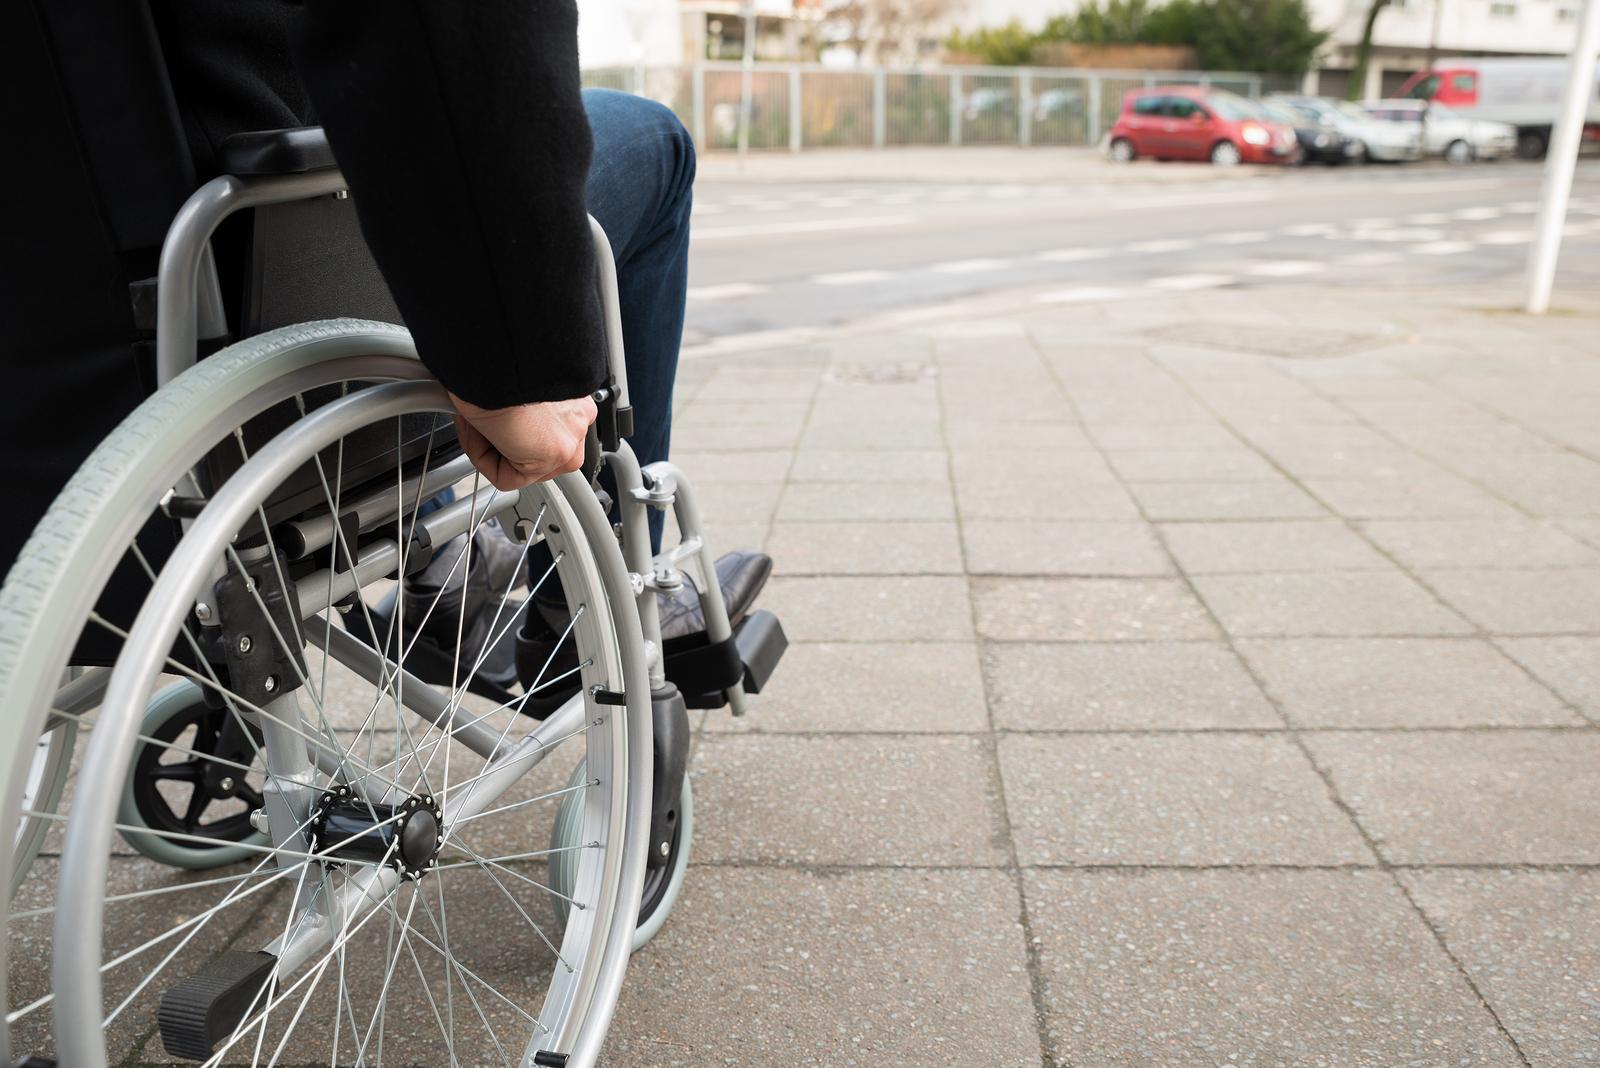 Charleston WV Paraplegia Attorney | The Love Law Firm